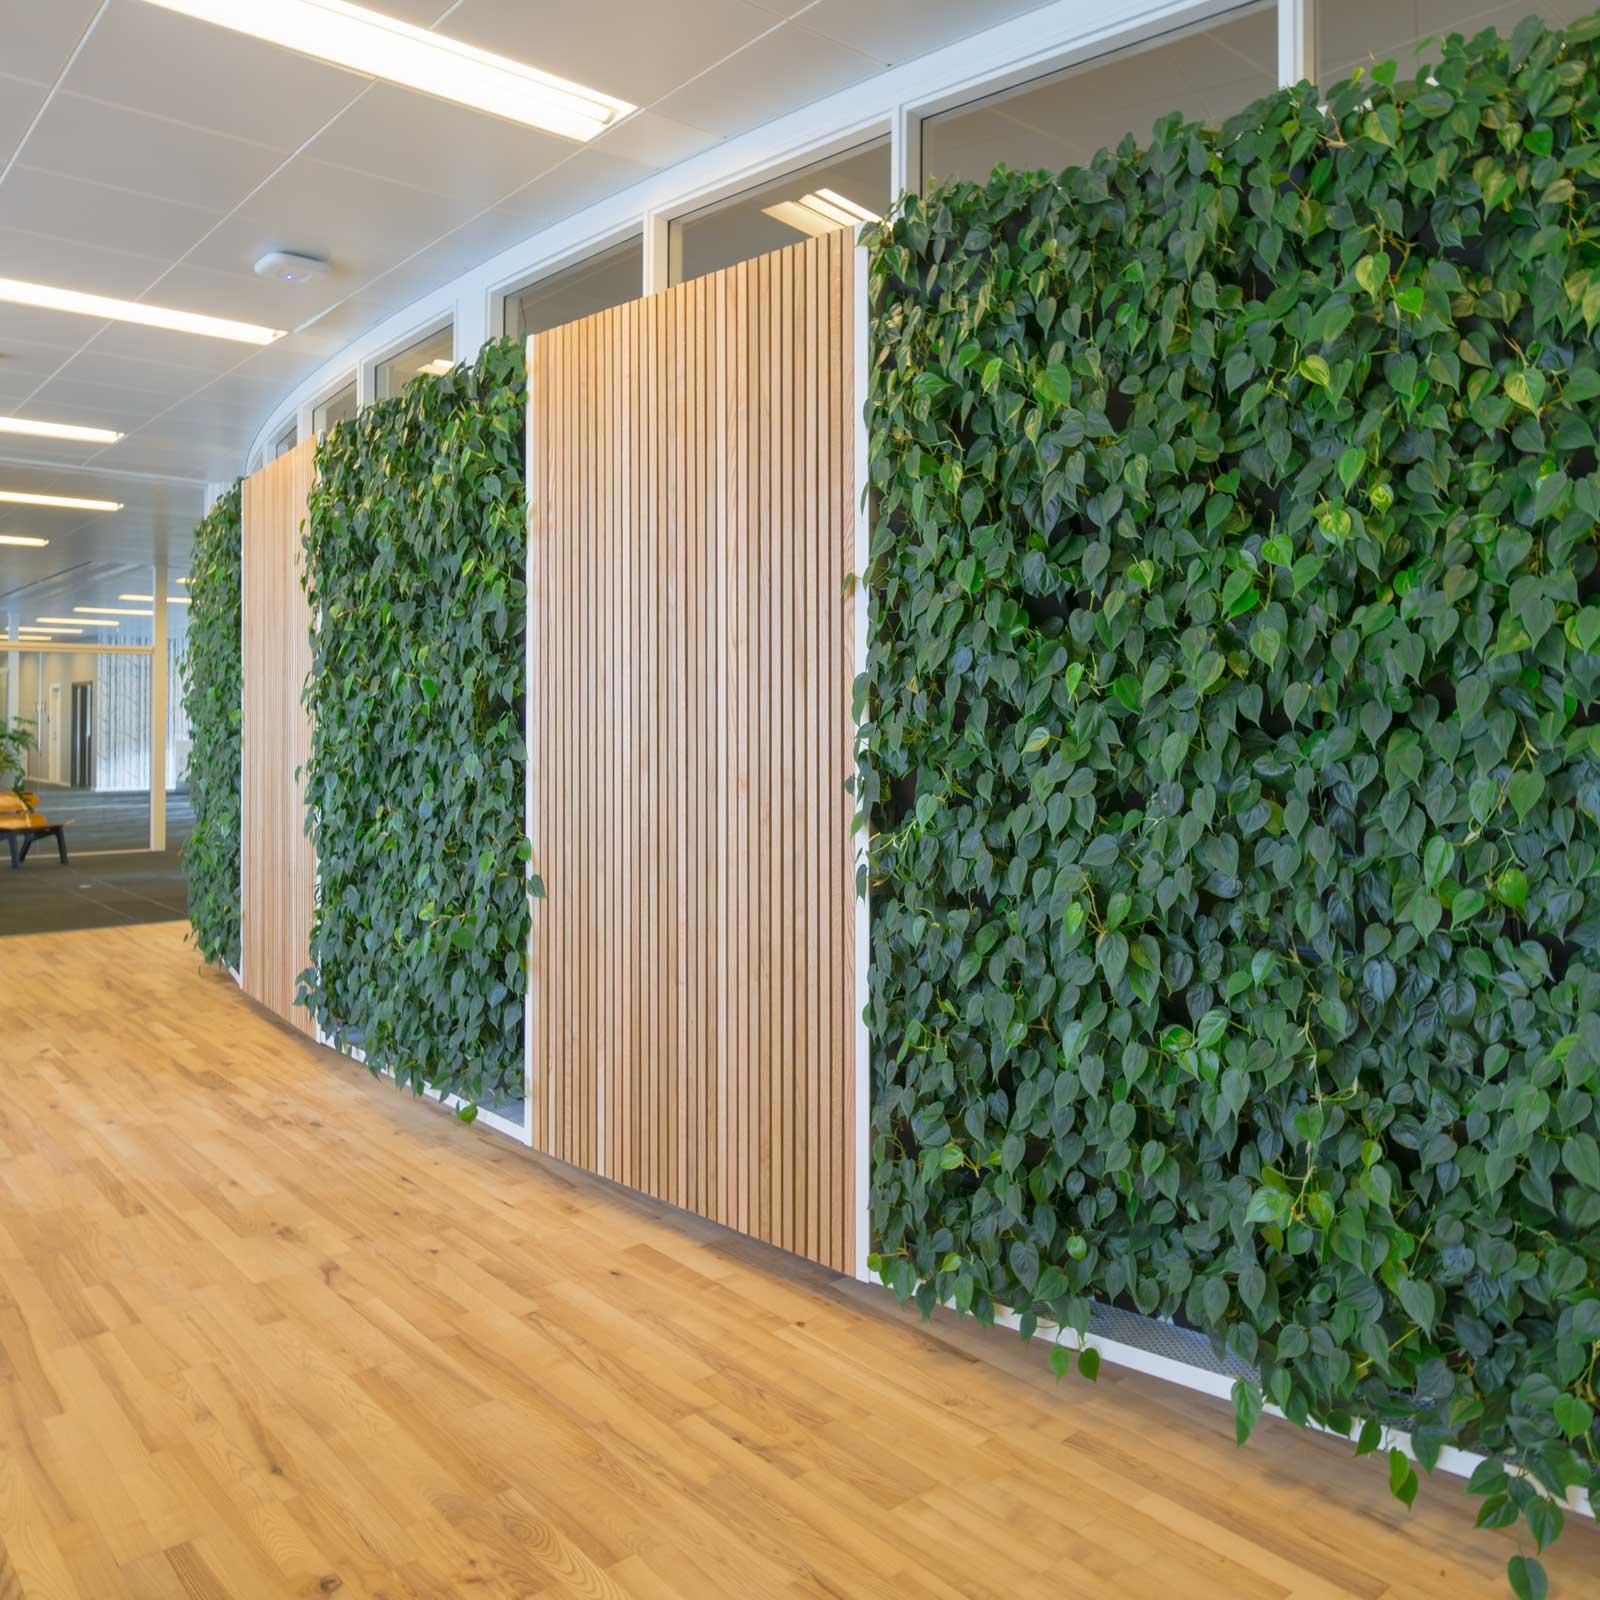 indbyggede plantevægge, plantevæg, plantevæg pris